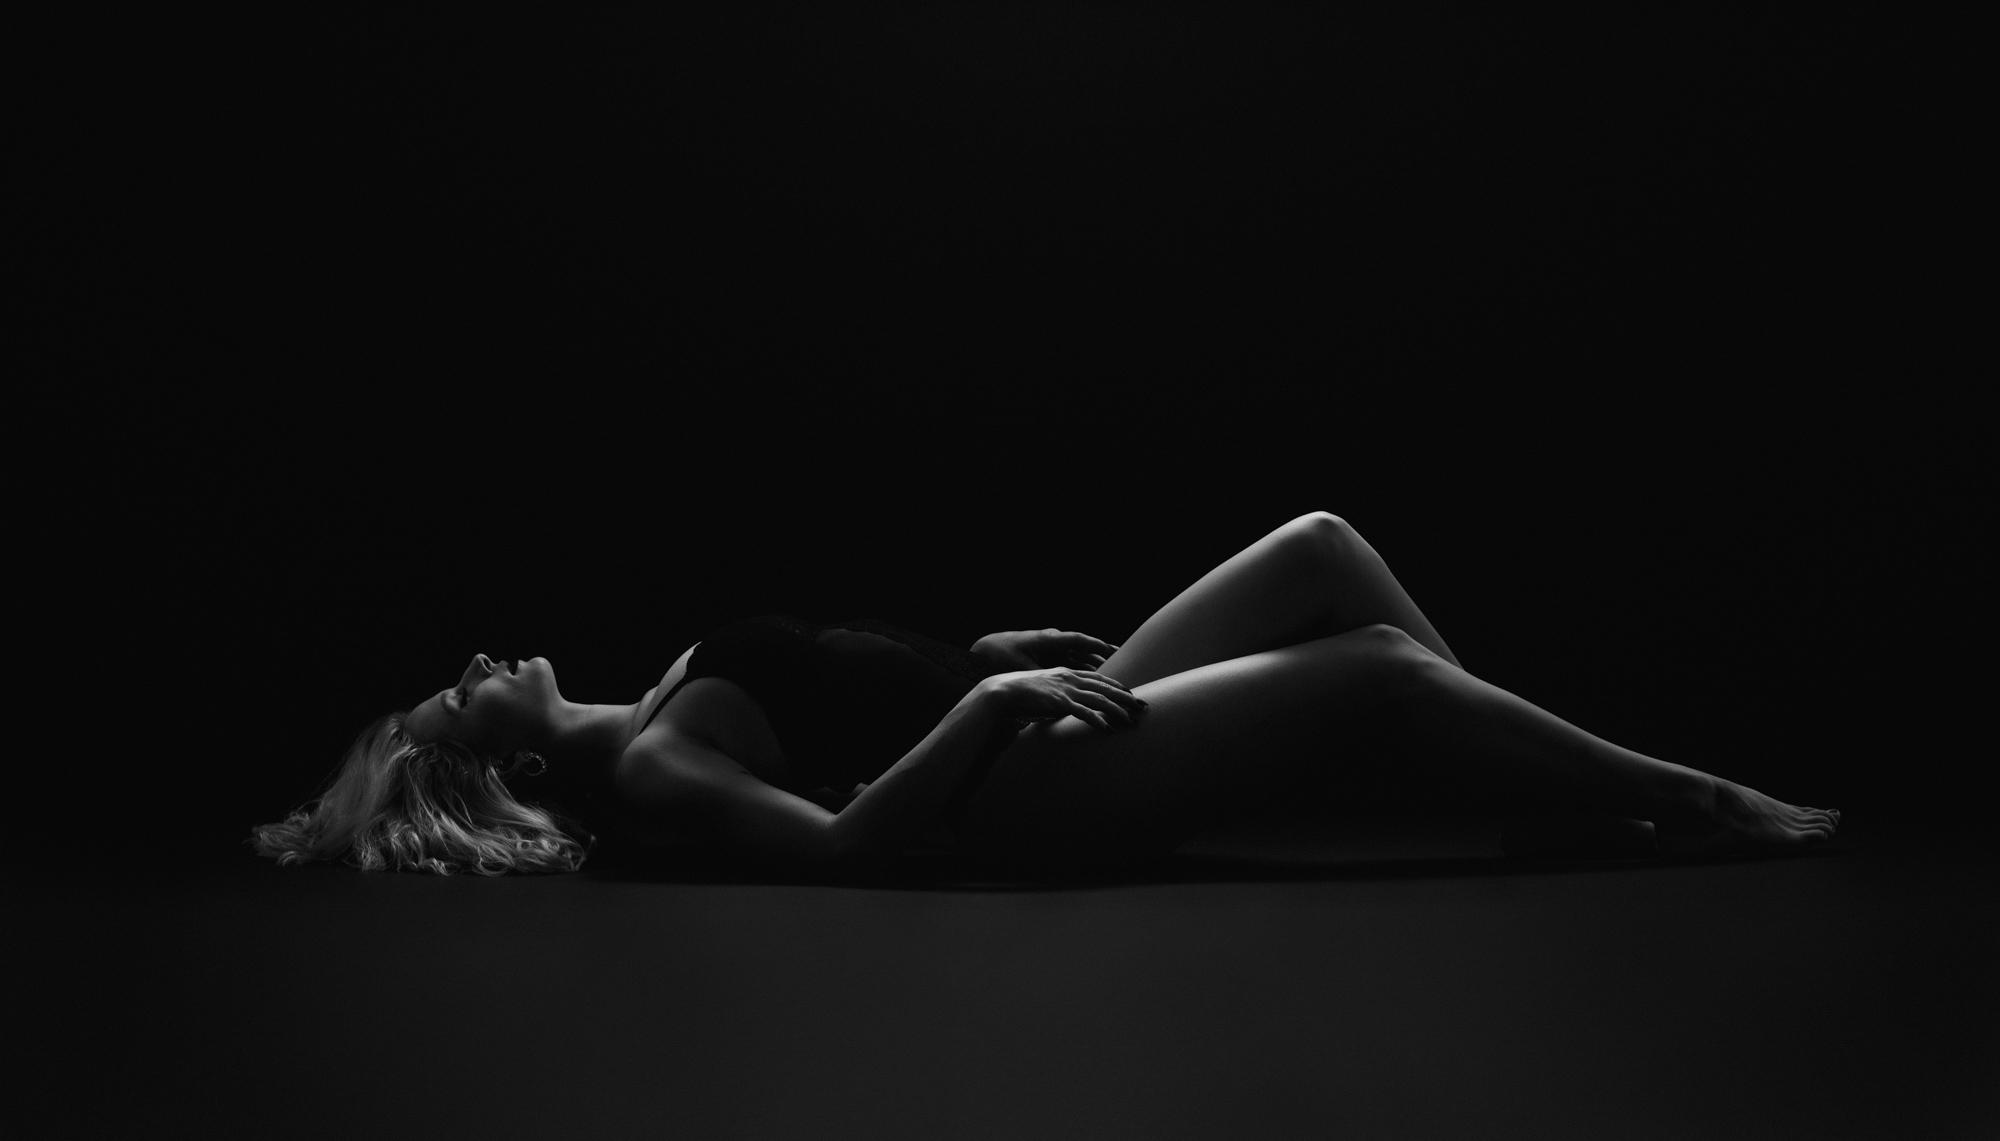 blonde in black bodysuit lying on her back